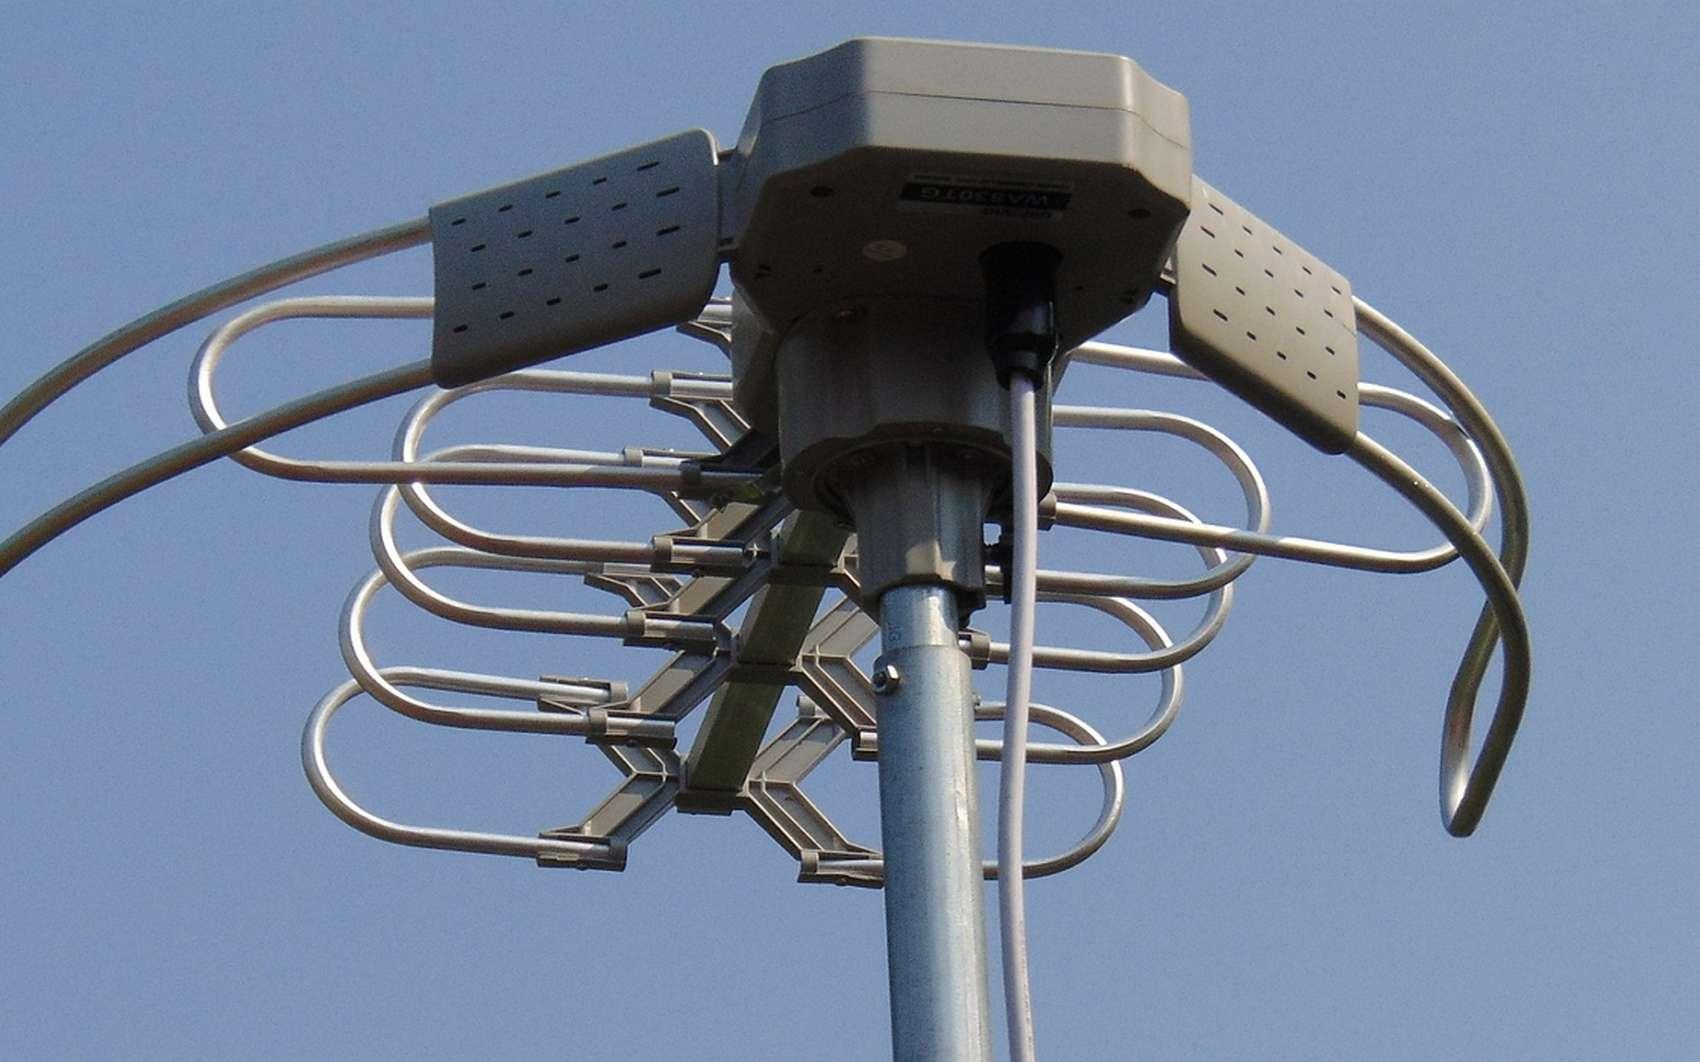 Qu'est ce qu'une bande UHF ? © TryJimmy, Pixabay